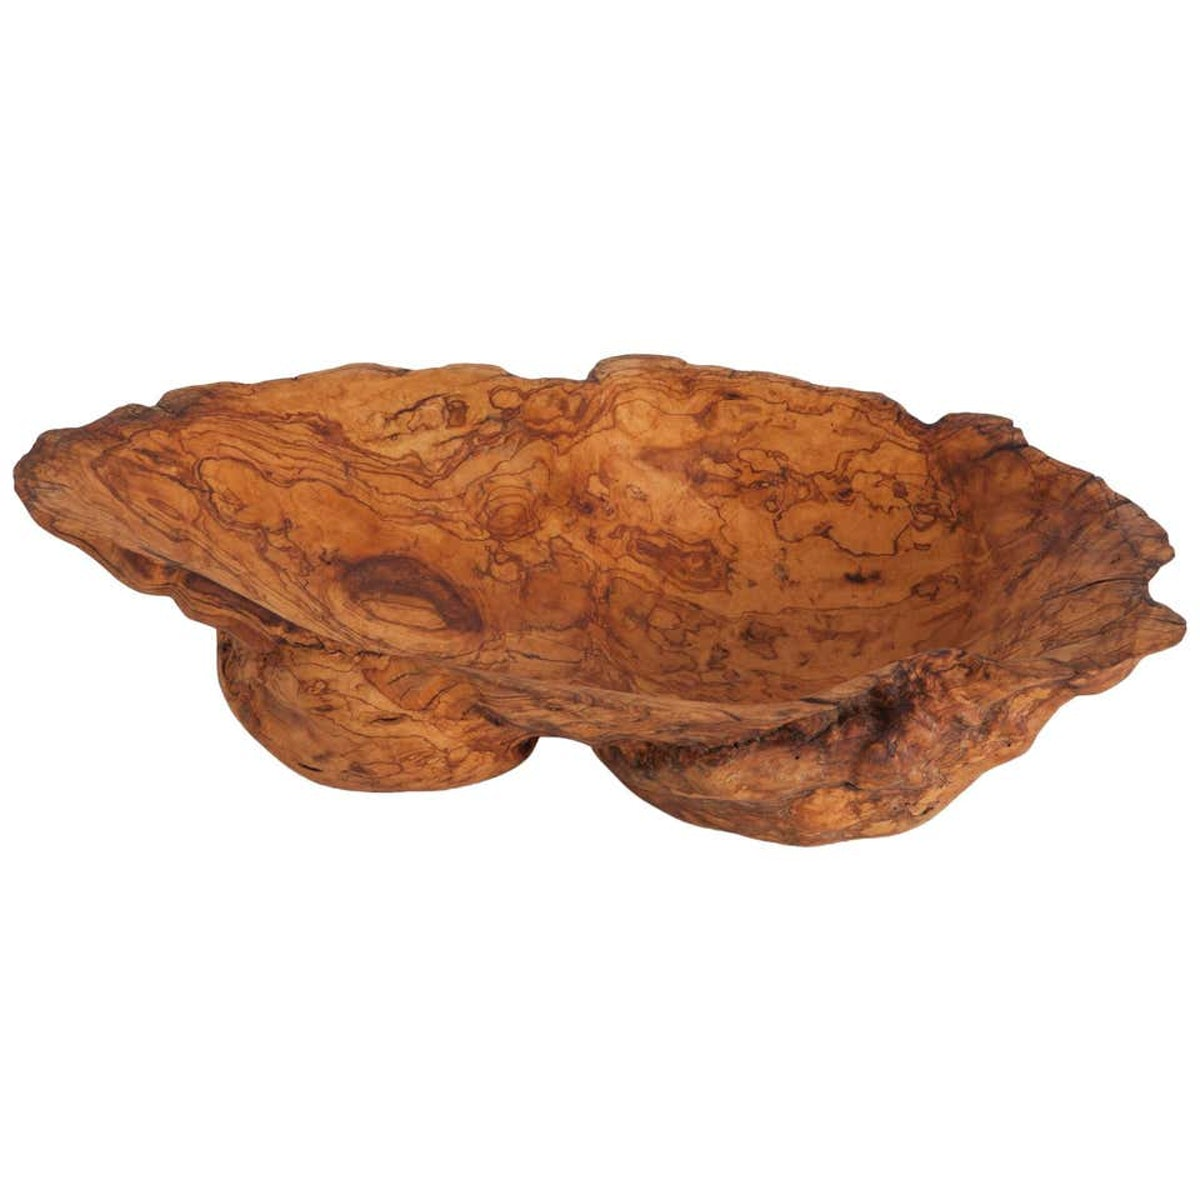 Natural History Wabi Sabi Olivewood Bowl or Sink